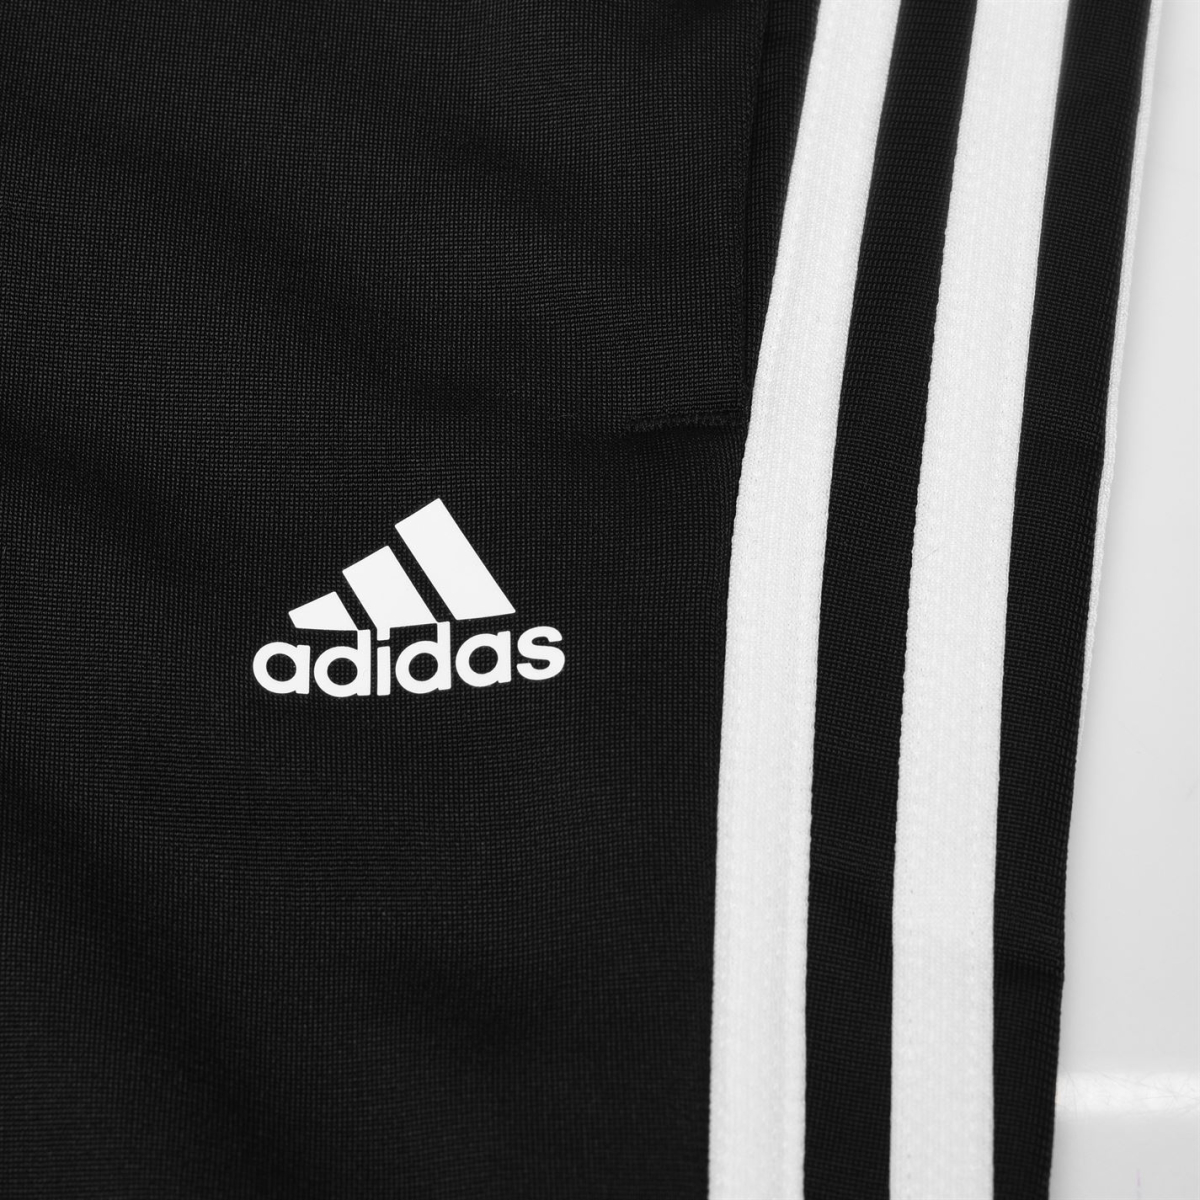 adidas Trainingsanzug Sportanzug Kinder Jungen Tiberio 8424